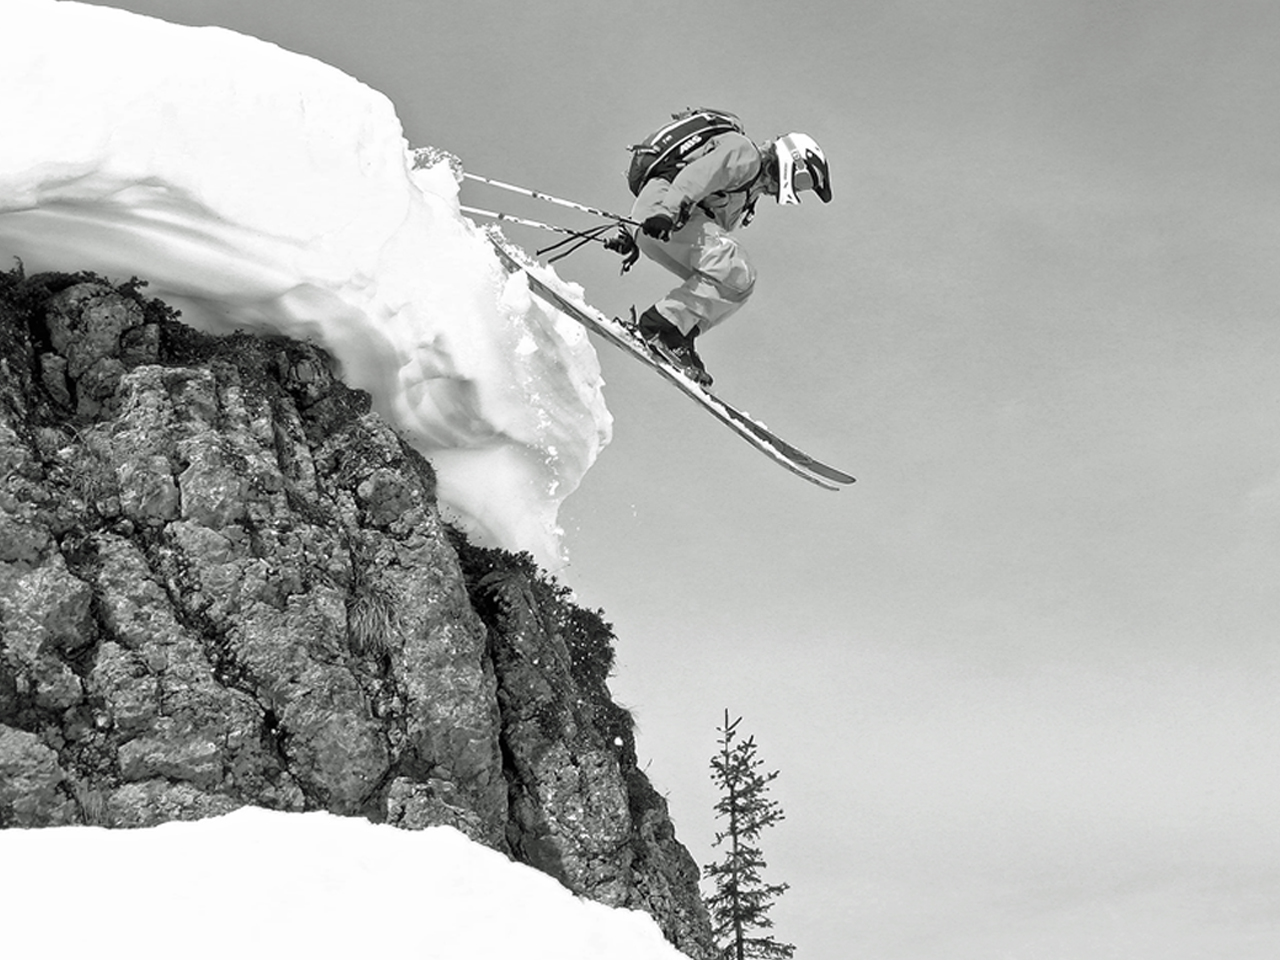 Activiteiten - Freeride jump